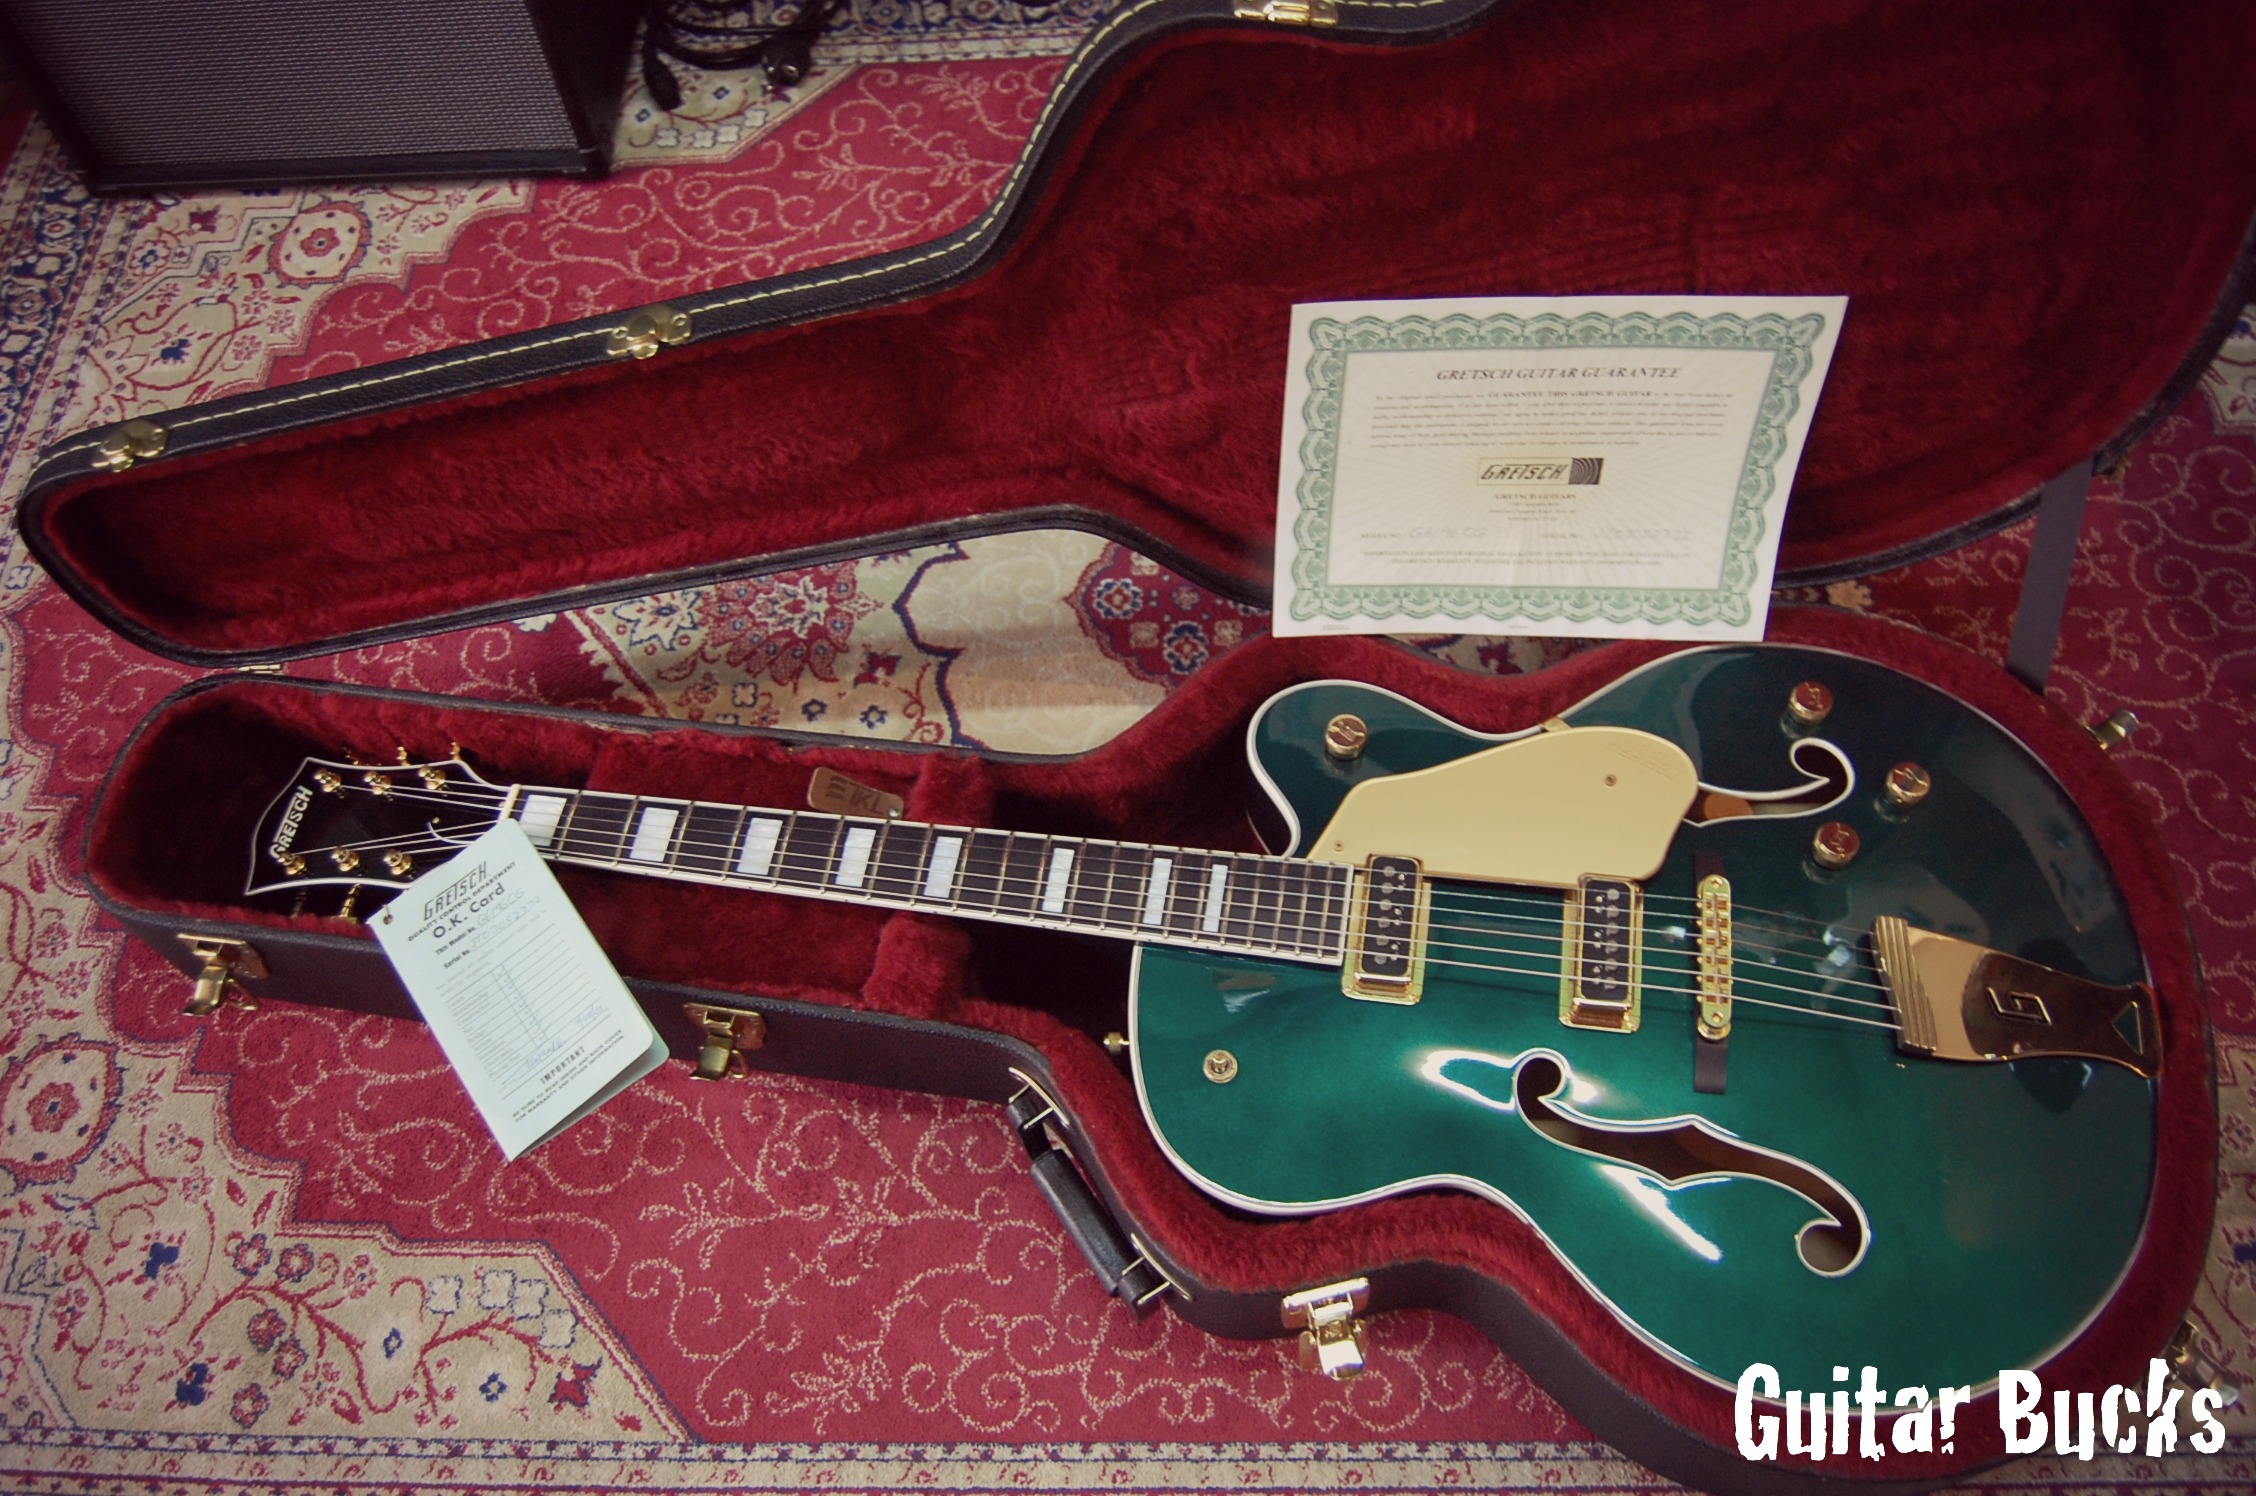 Gretsch 6196CG Country Club 2003 Cadillac Green Guitar